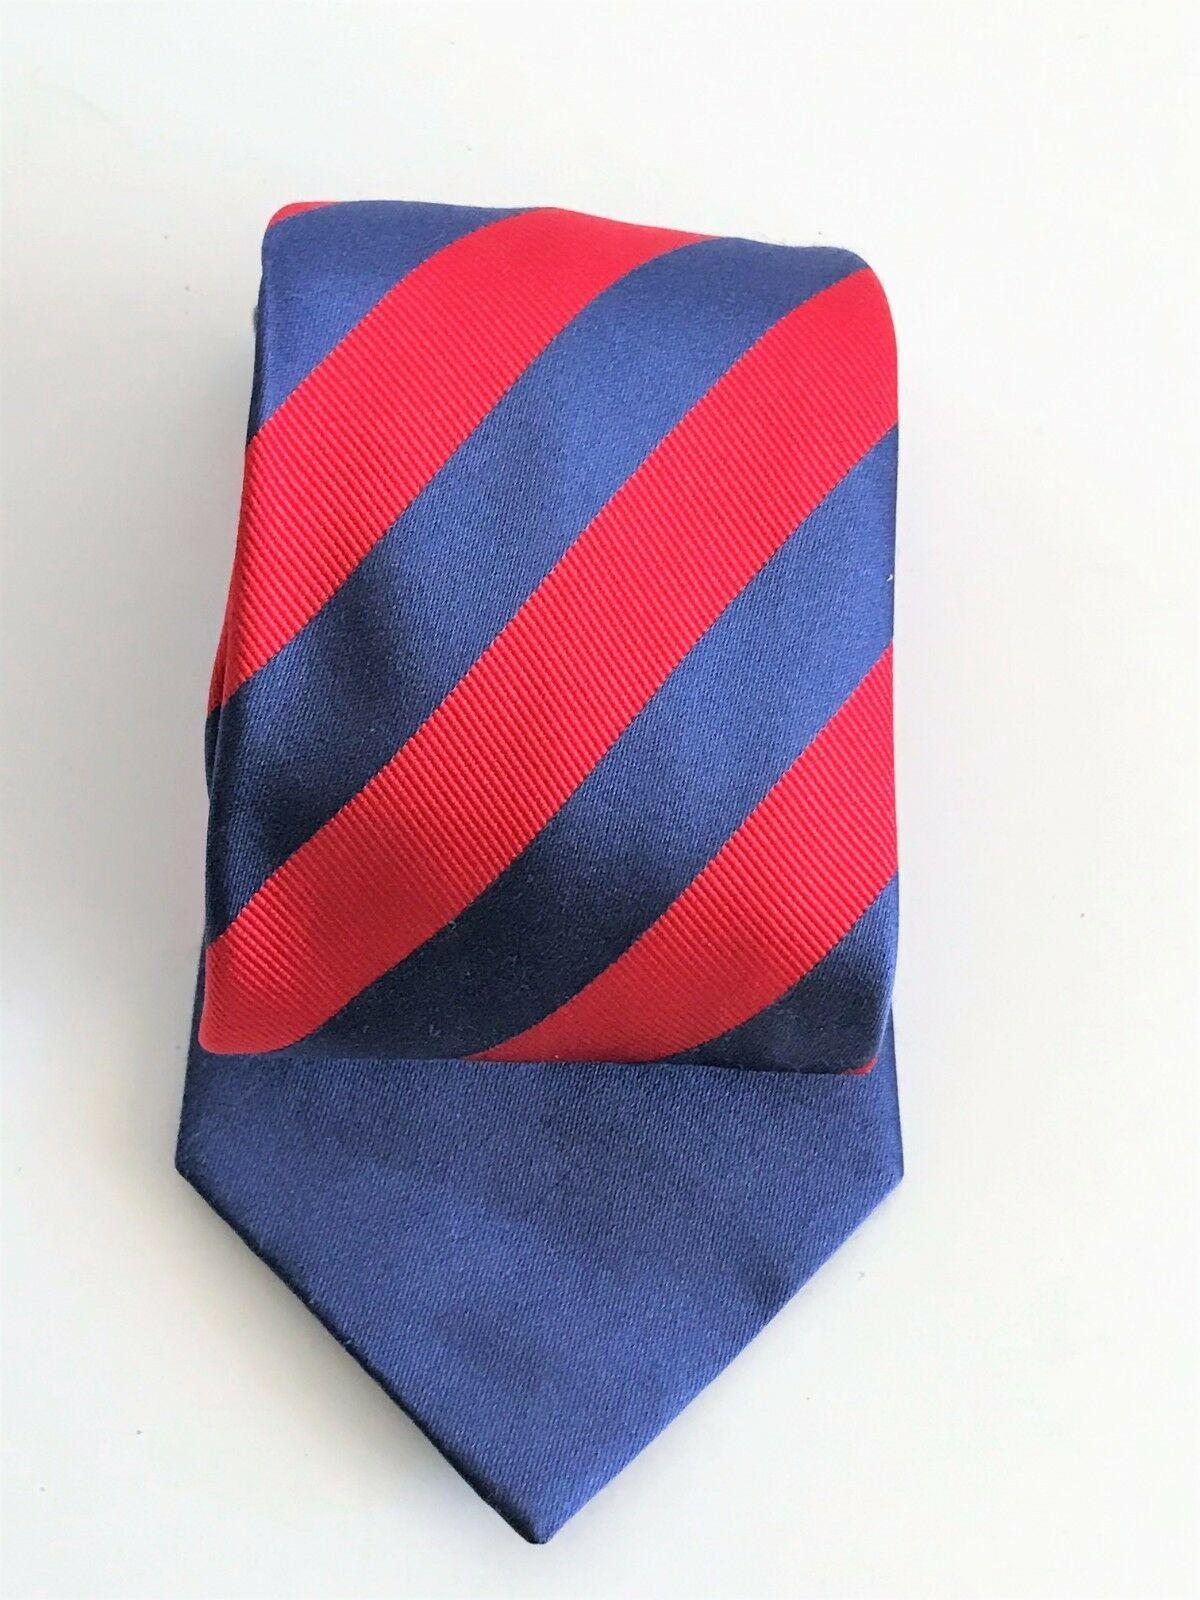 Kenneth Cole Reaction Men's Striped Blue & Red Silk Necktie image 3